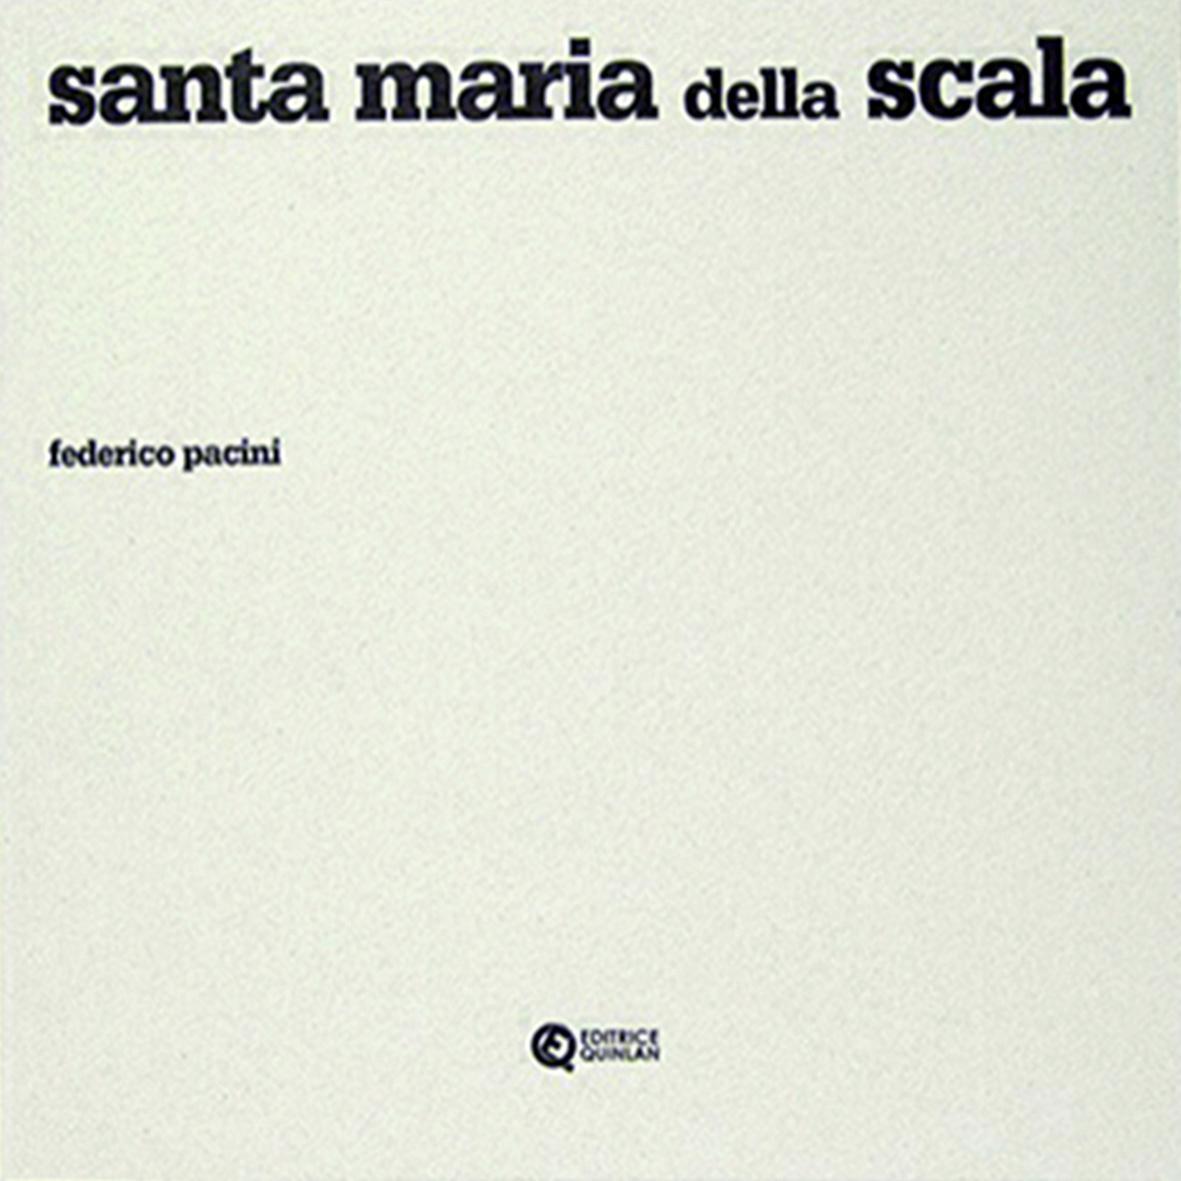 Federico Pacini, 'Santa Maria della Scala', Editrice Quinlan © l'autore/Quinlan